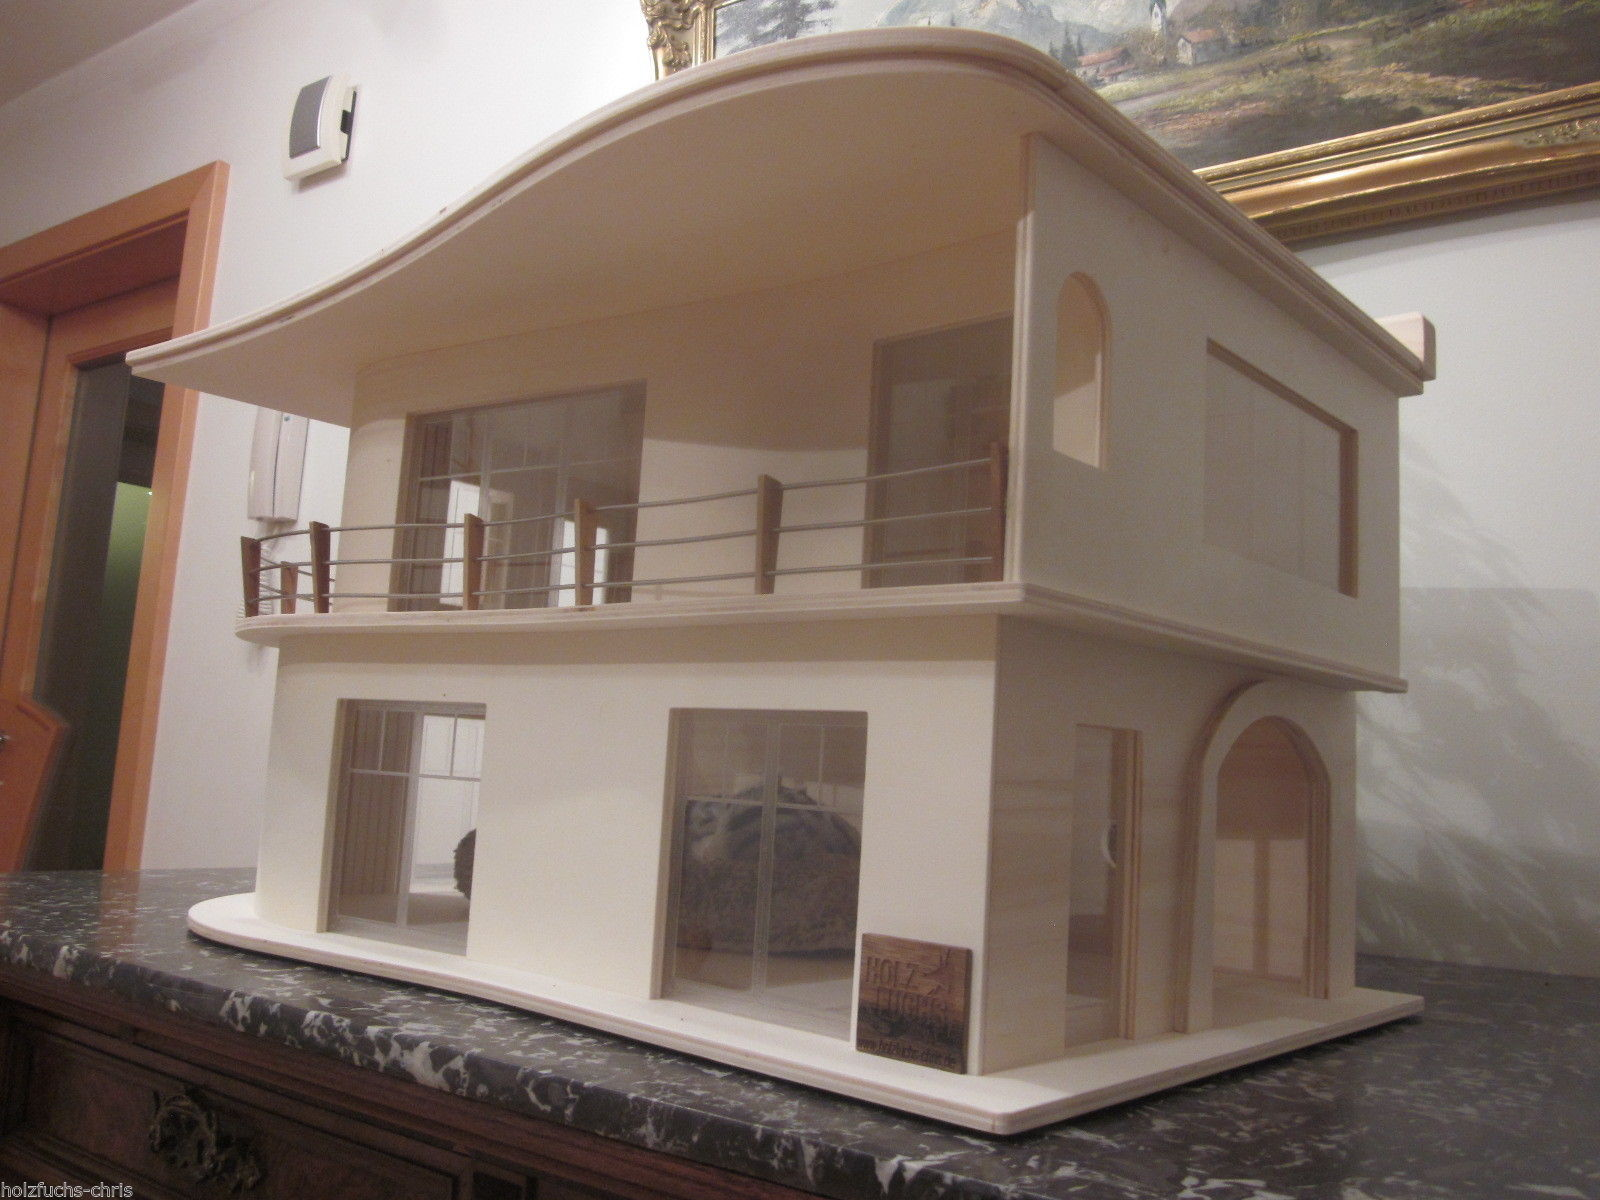 katzenhaus villa bauhaus unlasiert 3 katzen eldorado. Black Bedroom Furniture Sets. Home Design Ideas